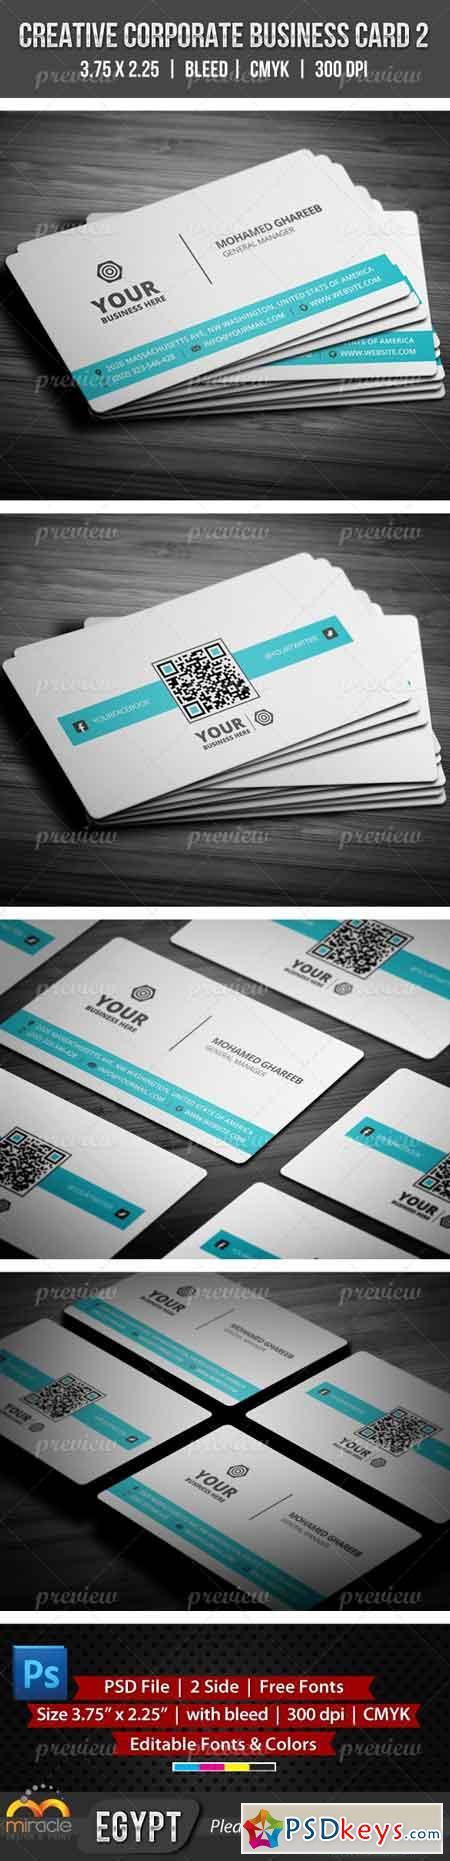 Creative Corporate Business Card 2 2060